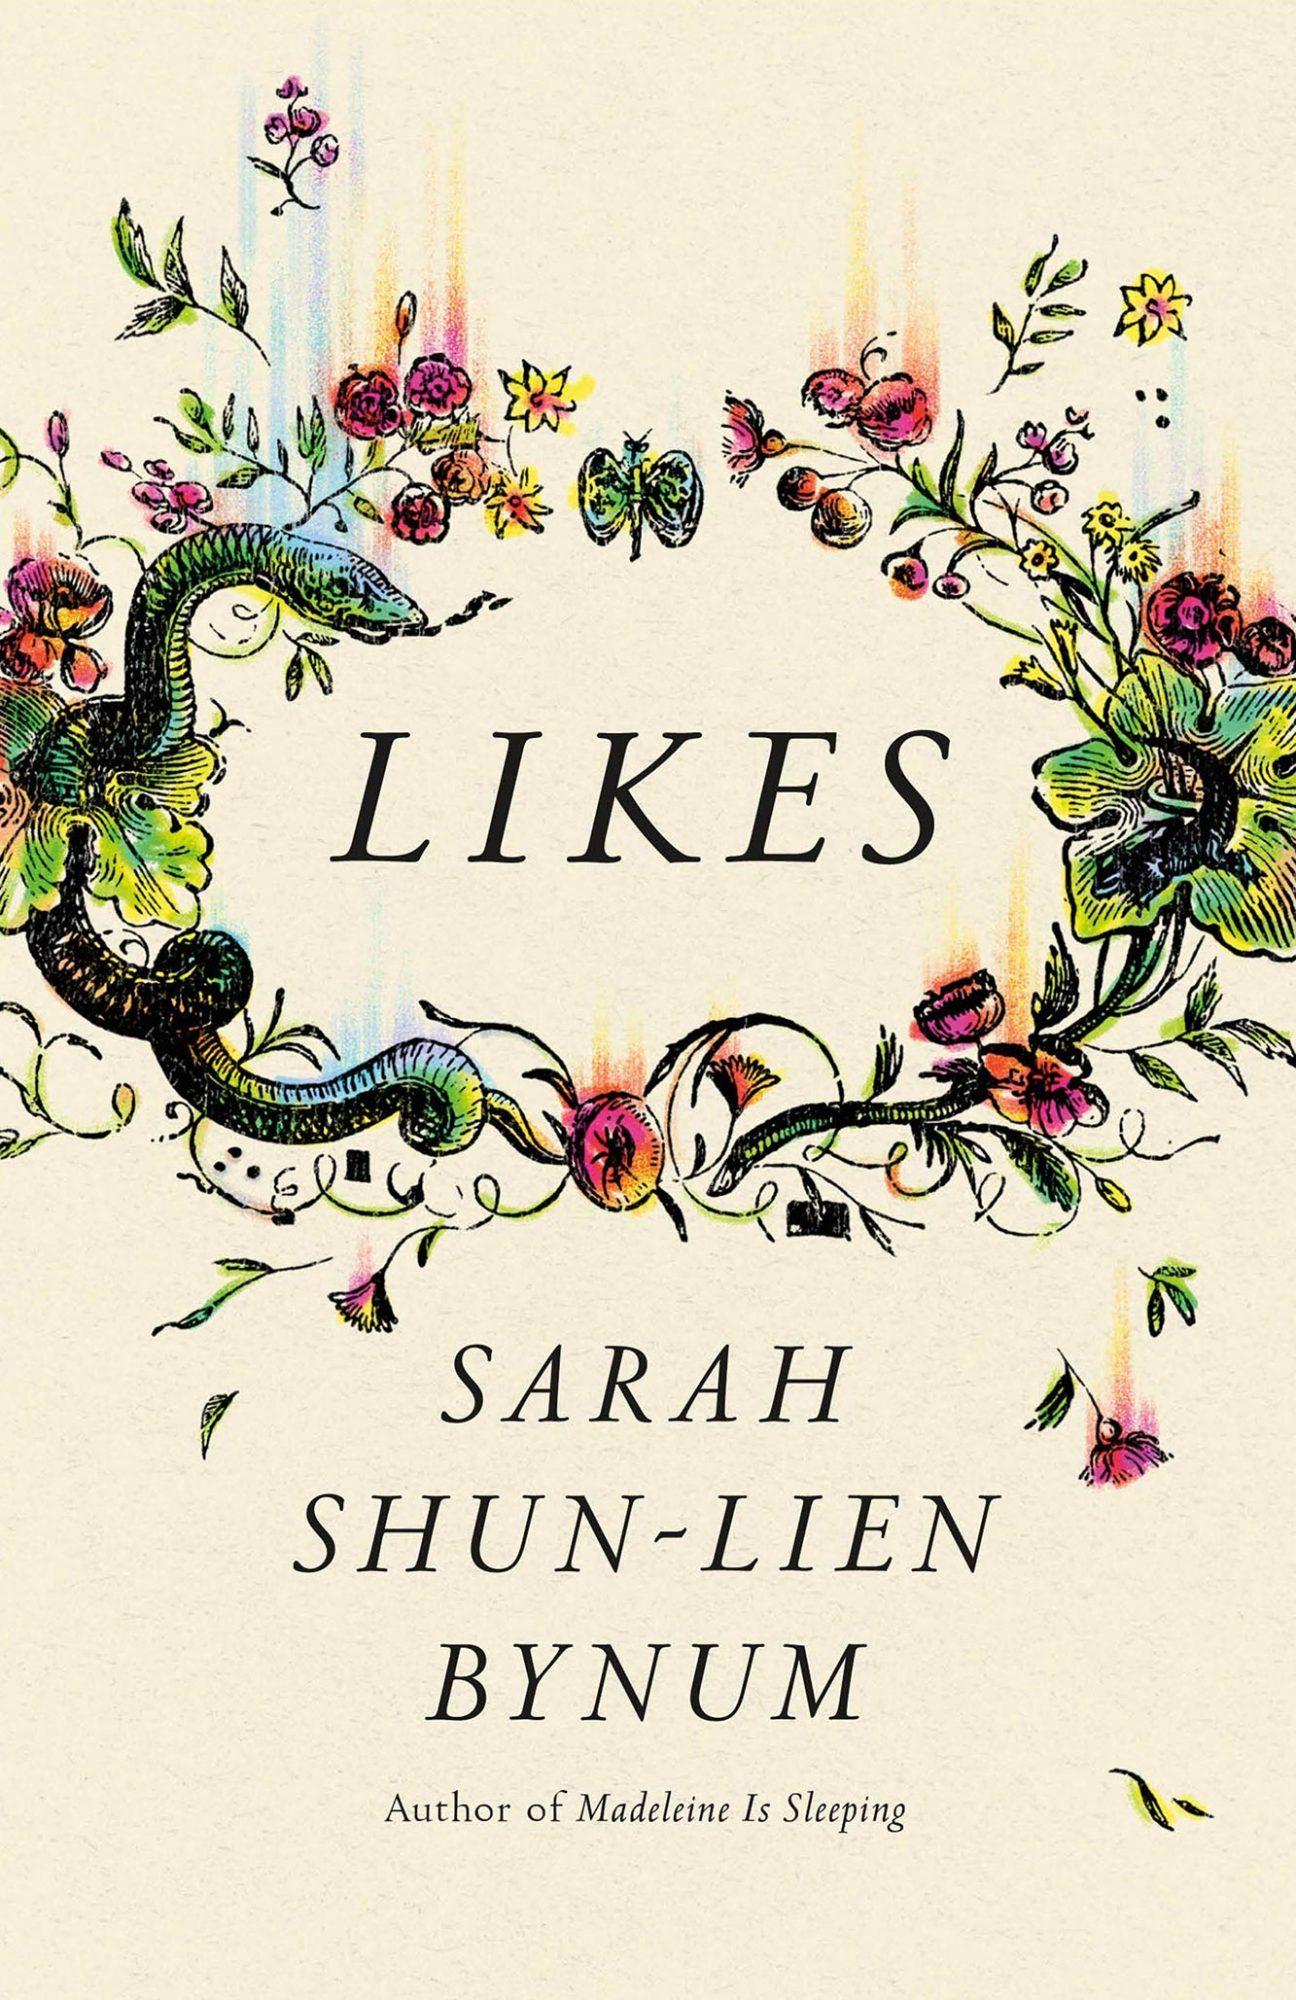 AAPI Books Likes by Sarah Shun-lien Bynum